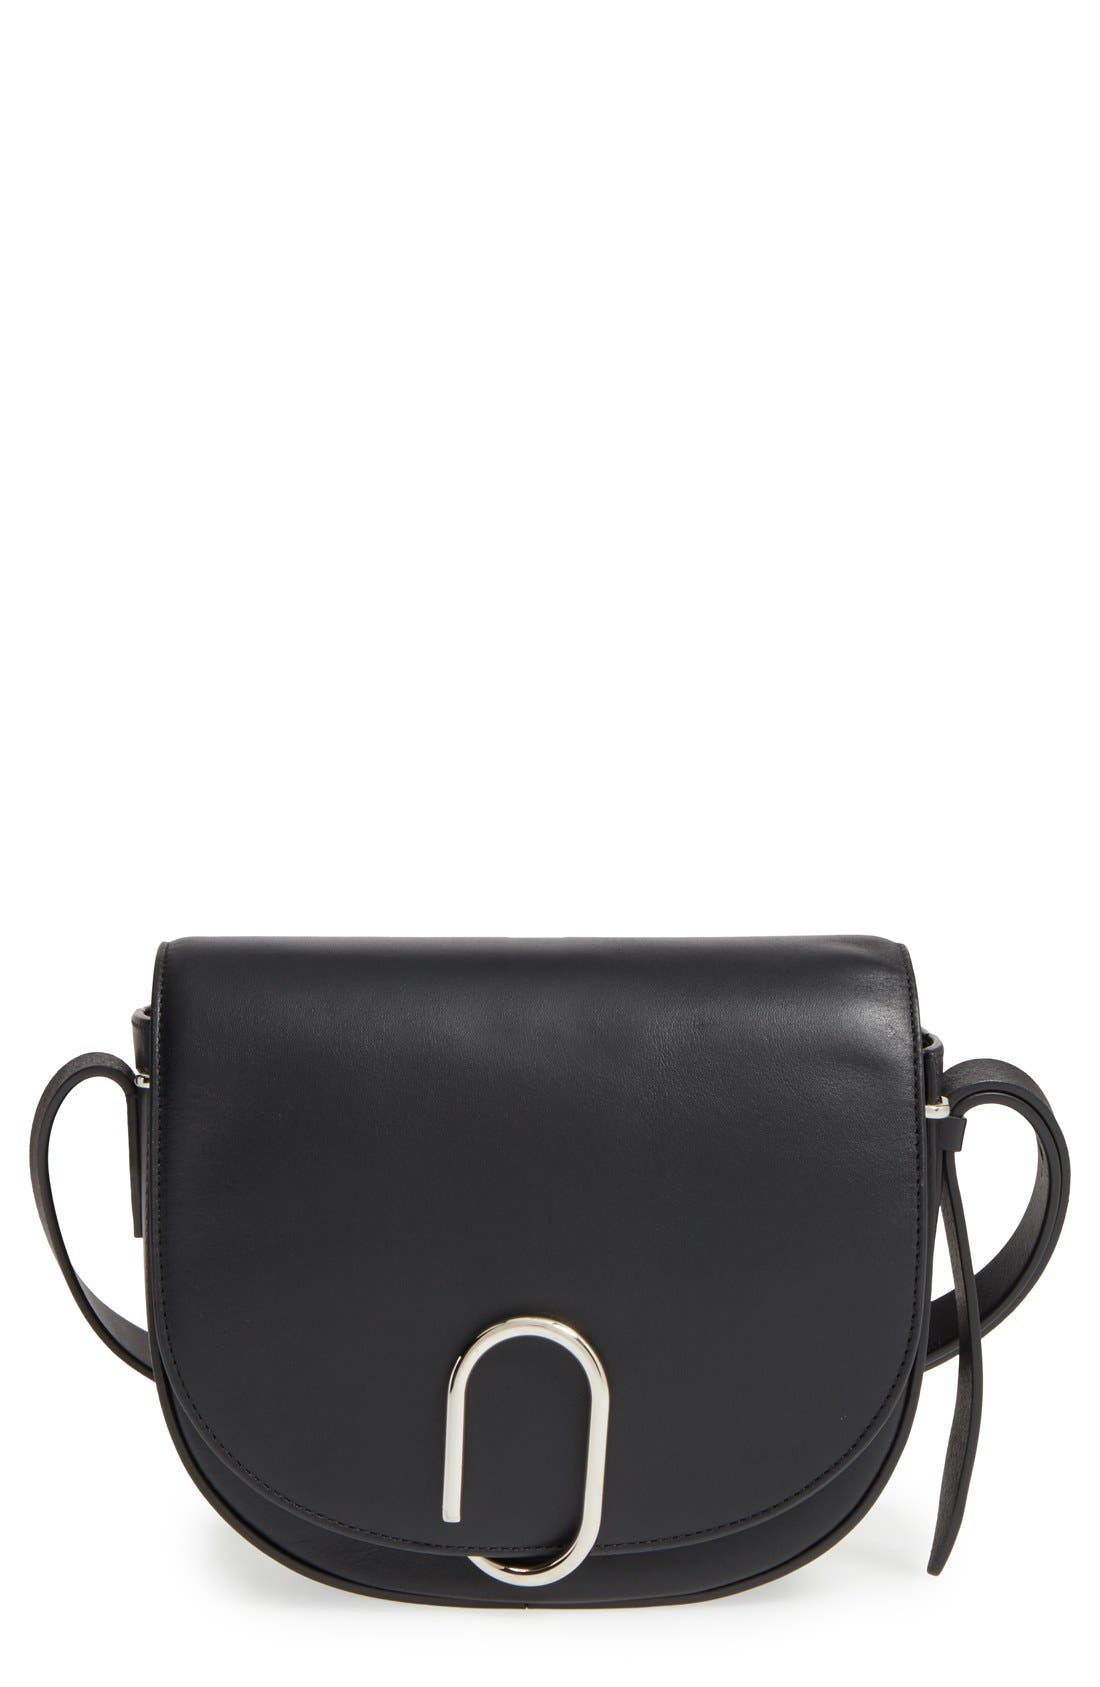 Alix Leather Saddle Bag,                         Main,                         color,